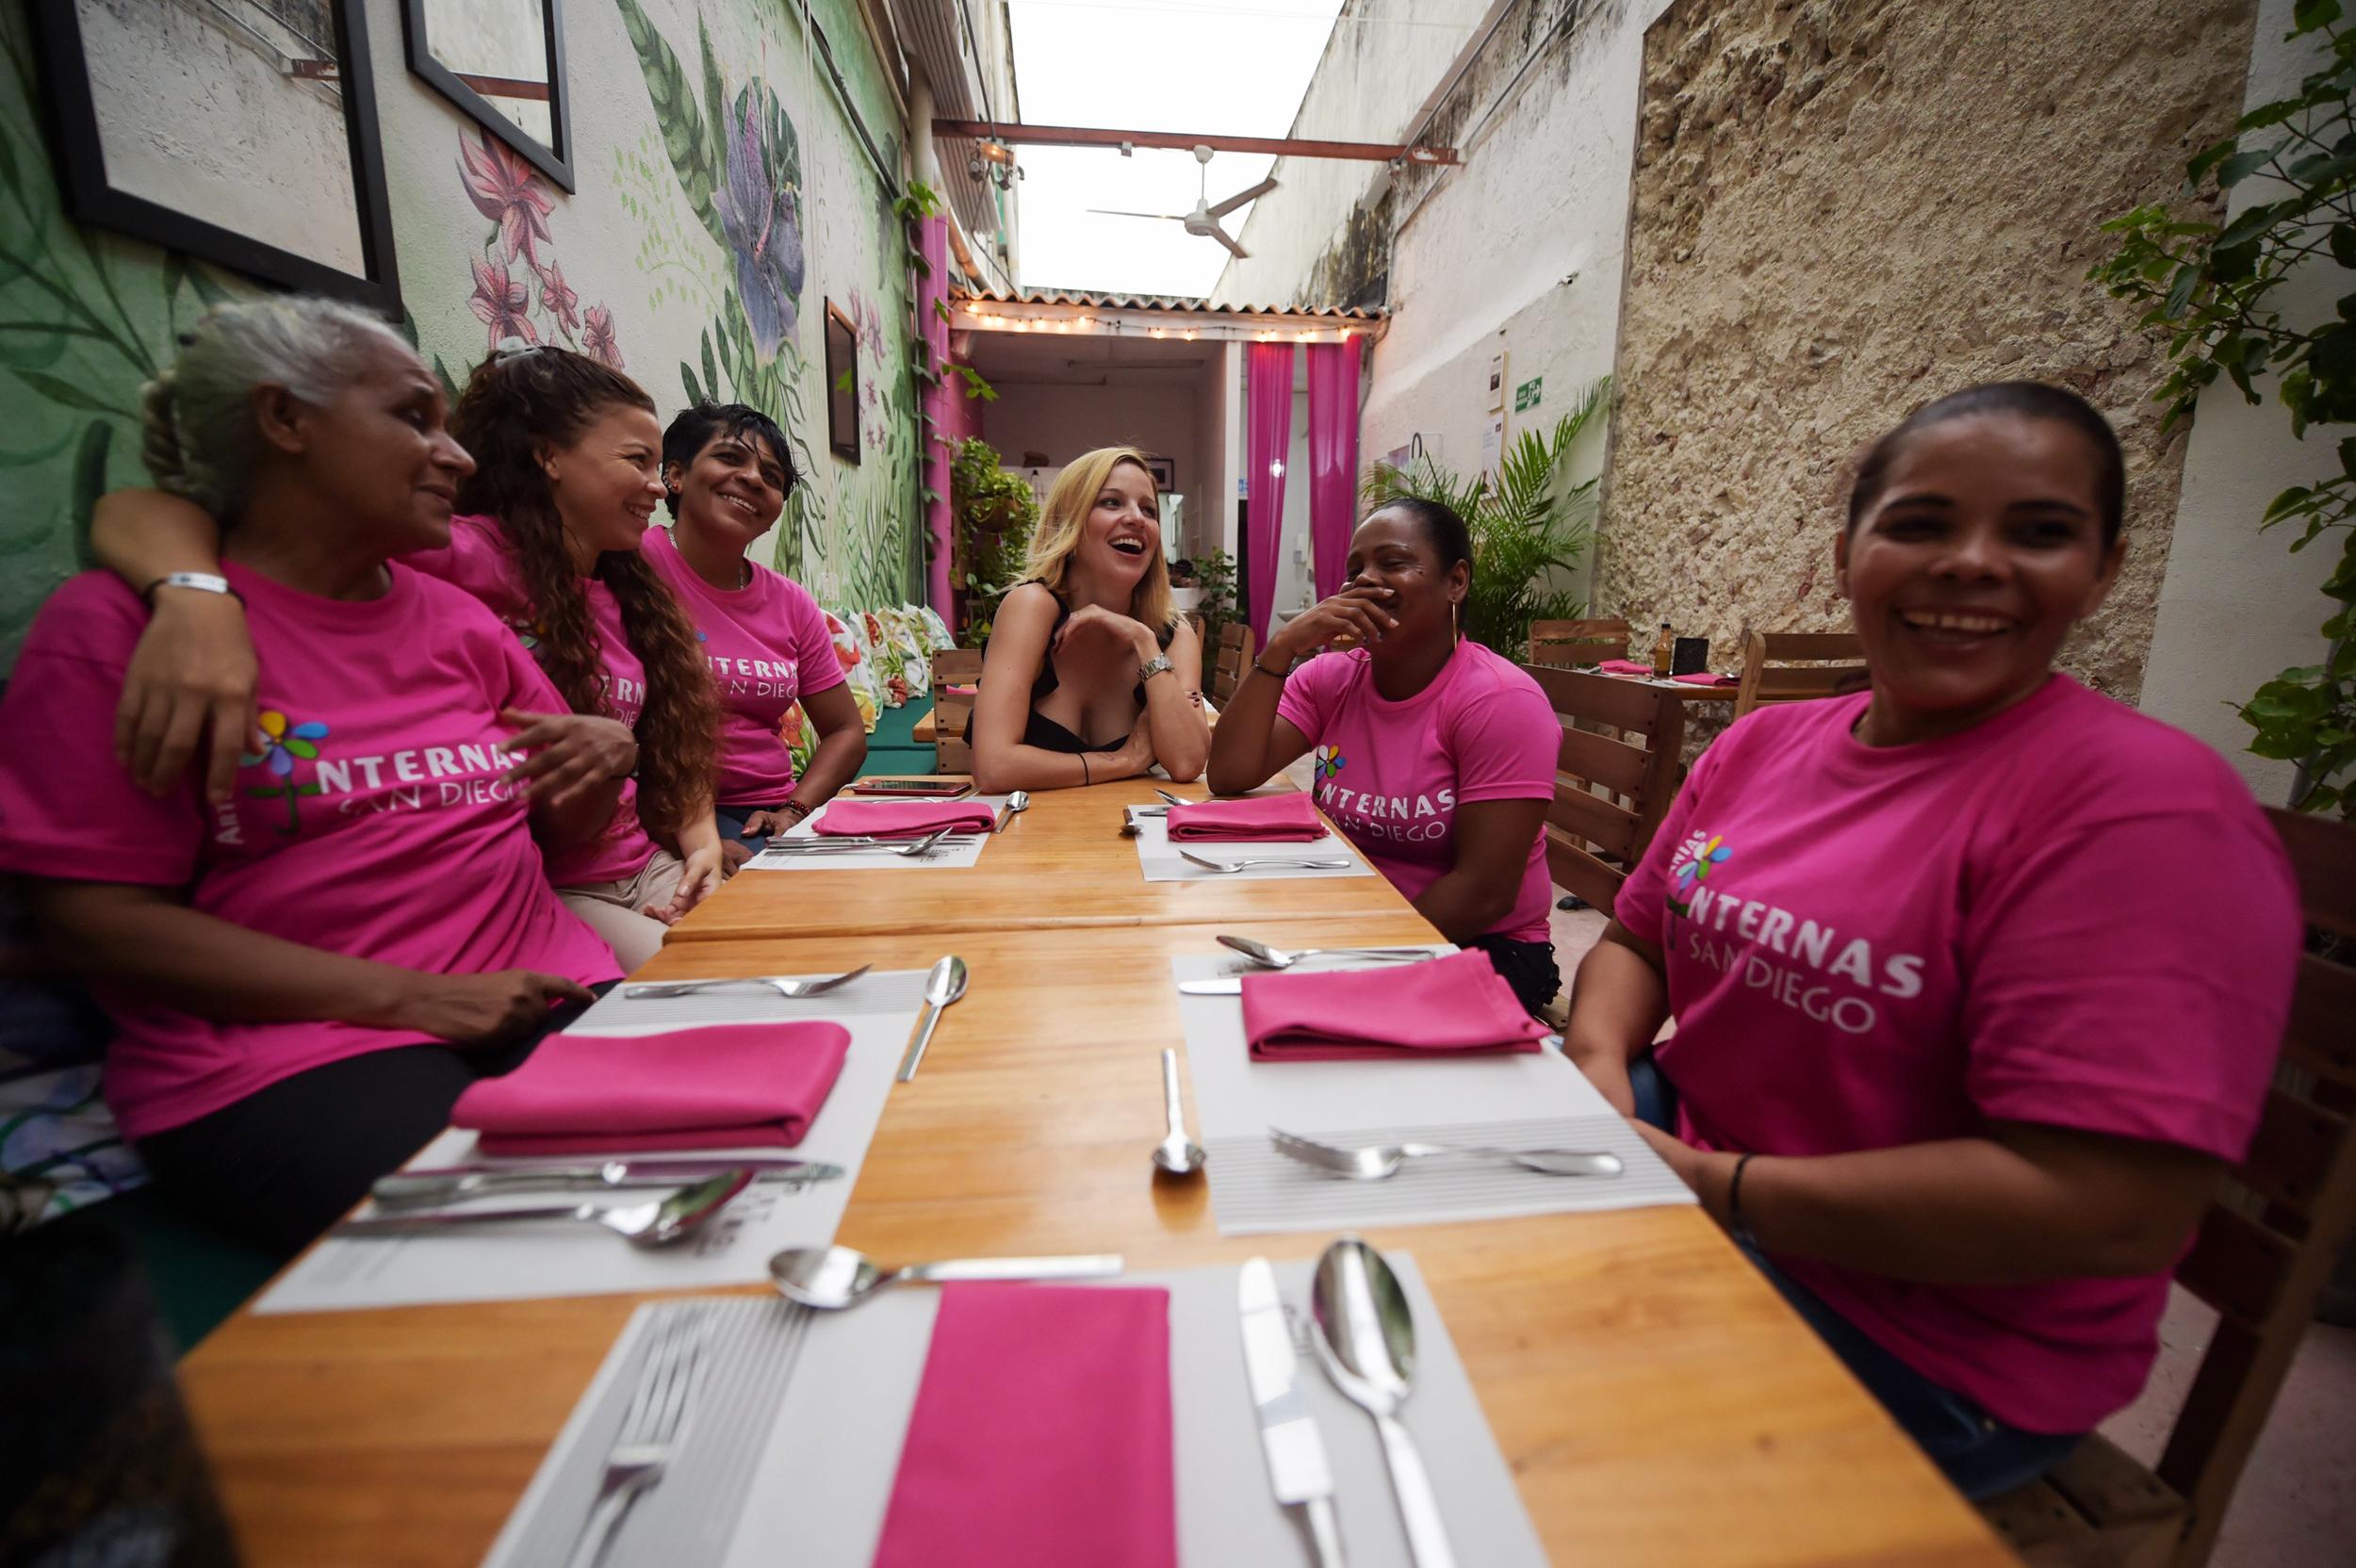 Image: Johanna Bahamon sits with inmates at the Interno restaurant